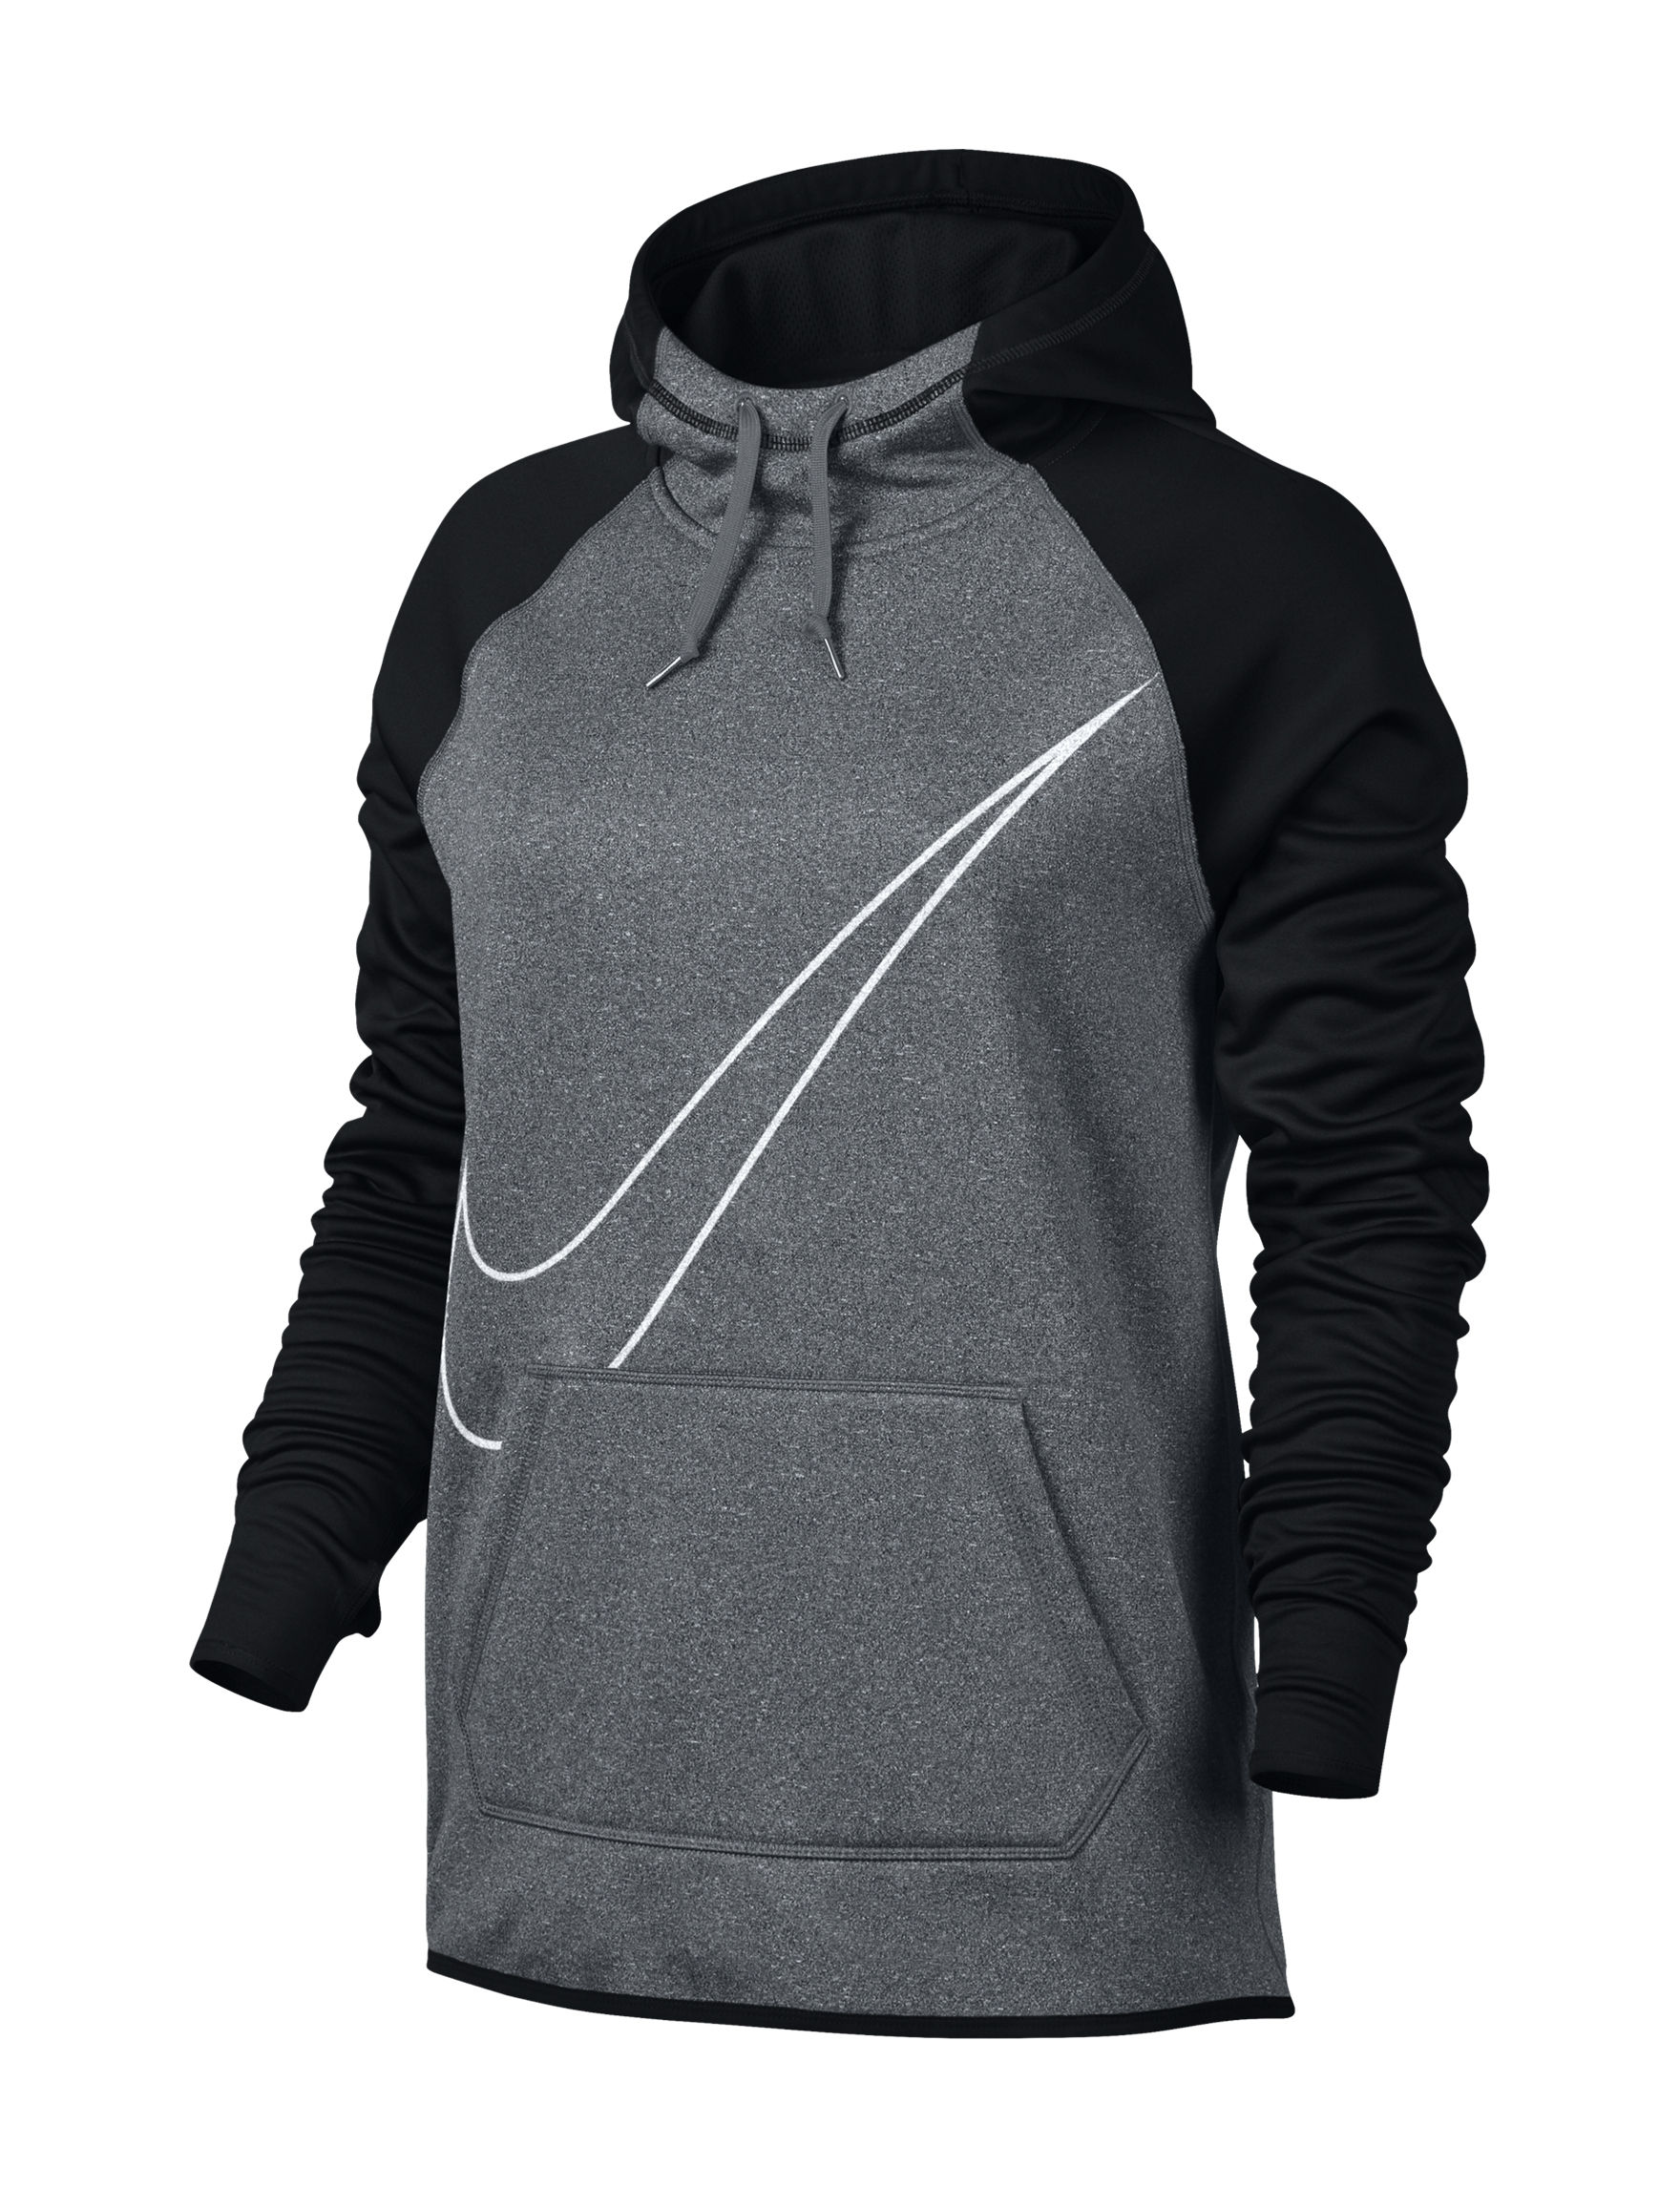 Nike Grey / White Lightweight Jackets & Blazers